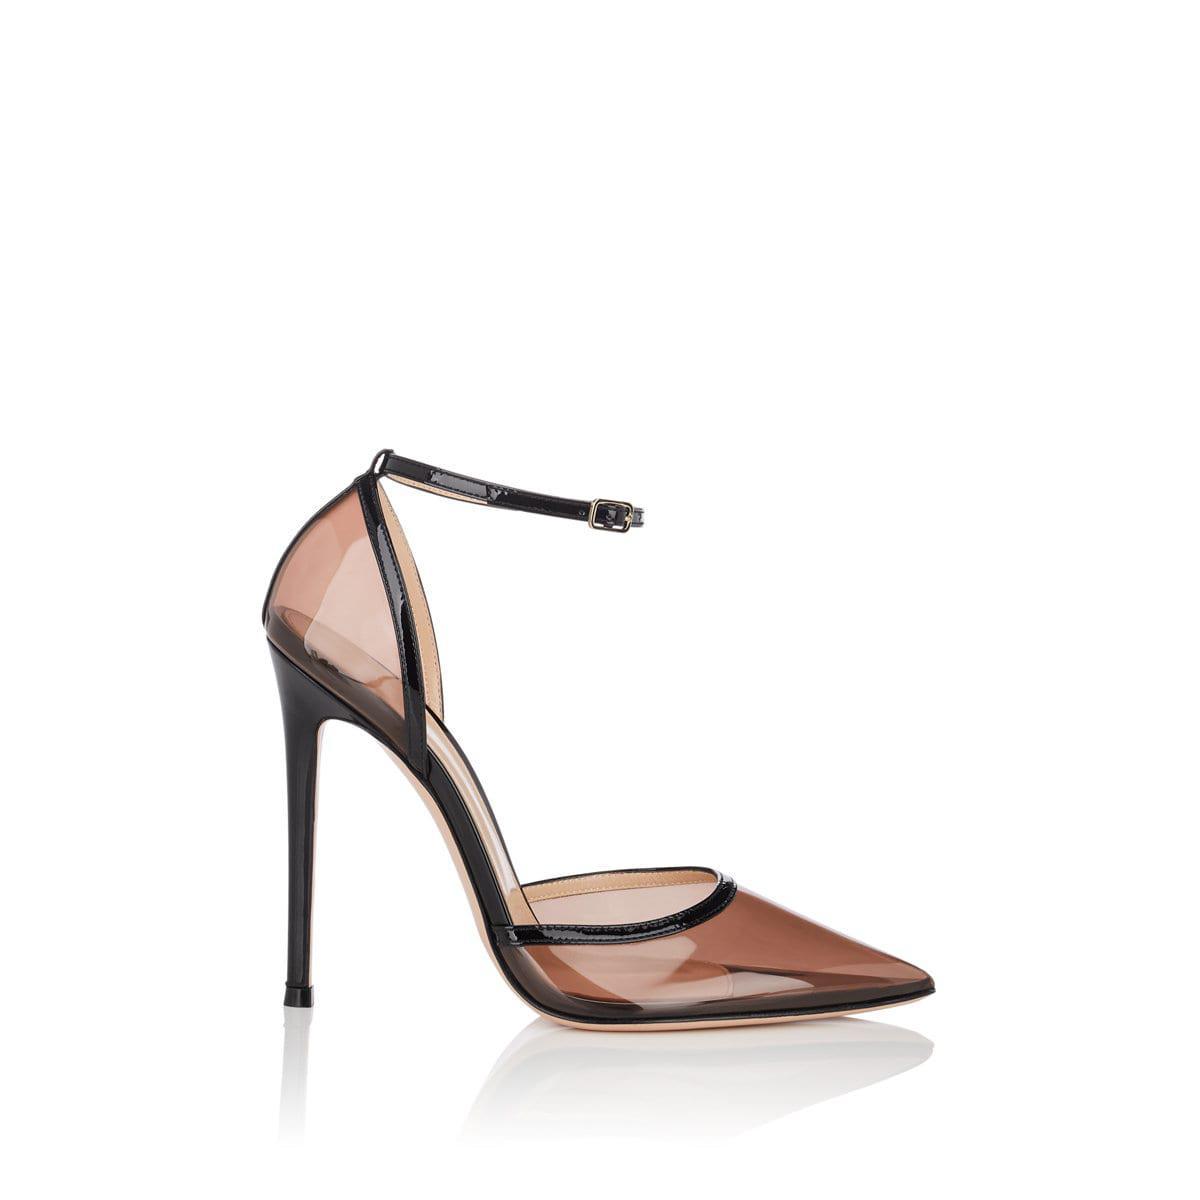 9d6c93c9d81 Lyst - Gianvito Rossi Sabin Pvc   Patent Leather Ankle-strap Pumps ...